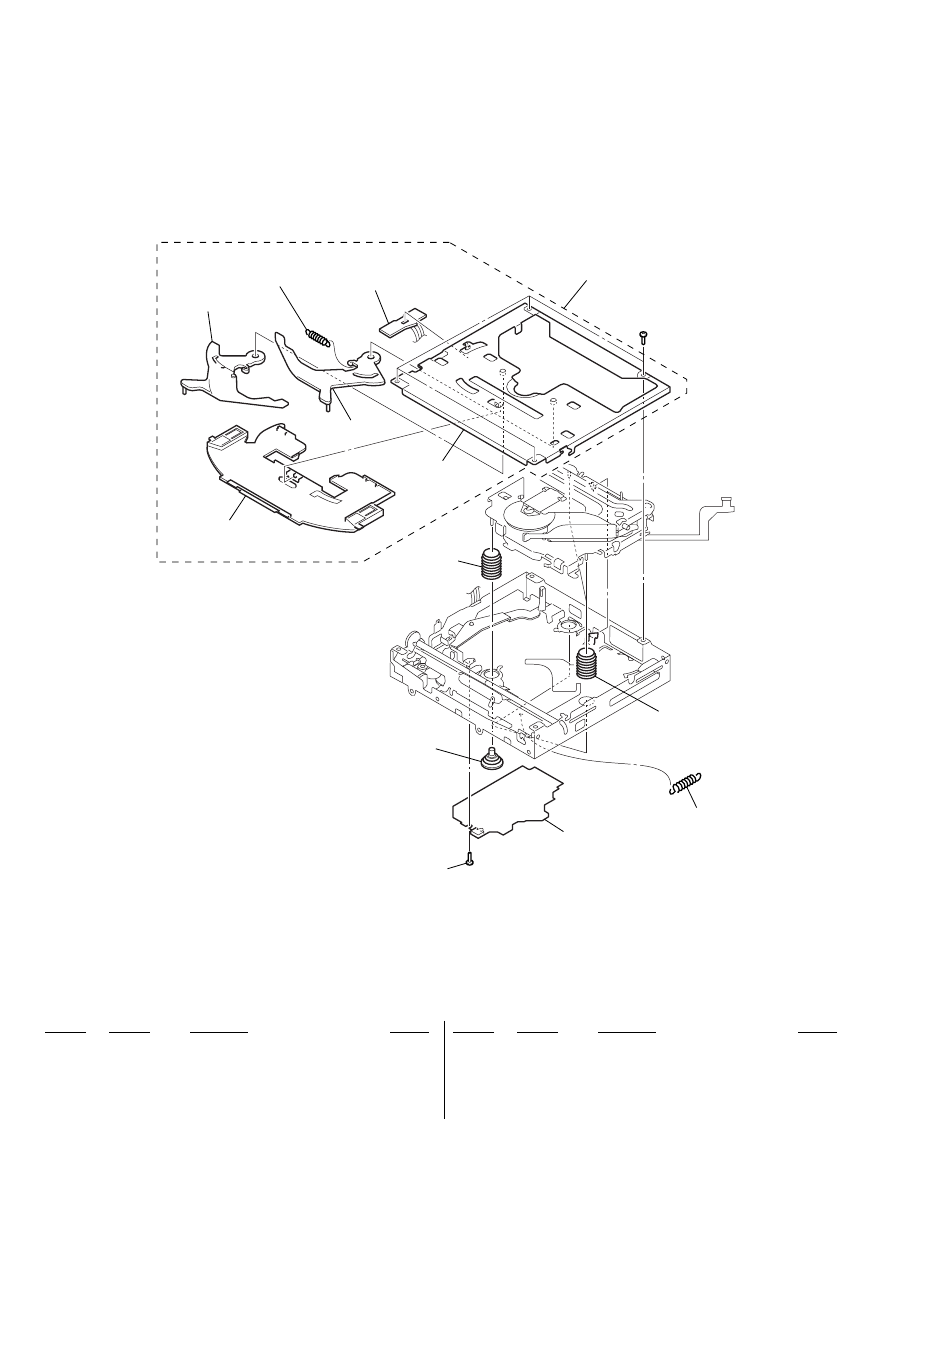 Sony Cdx F7710 F7710s F7715x F7750 F7750s Wiring Diagram Service Manual Page 4